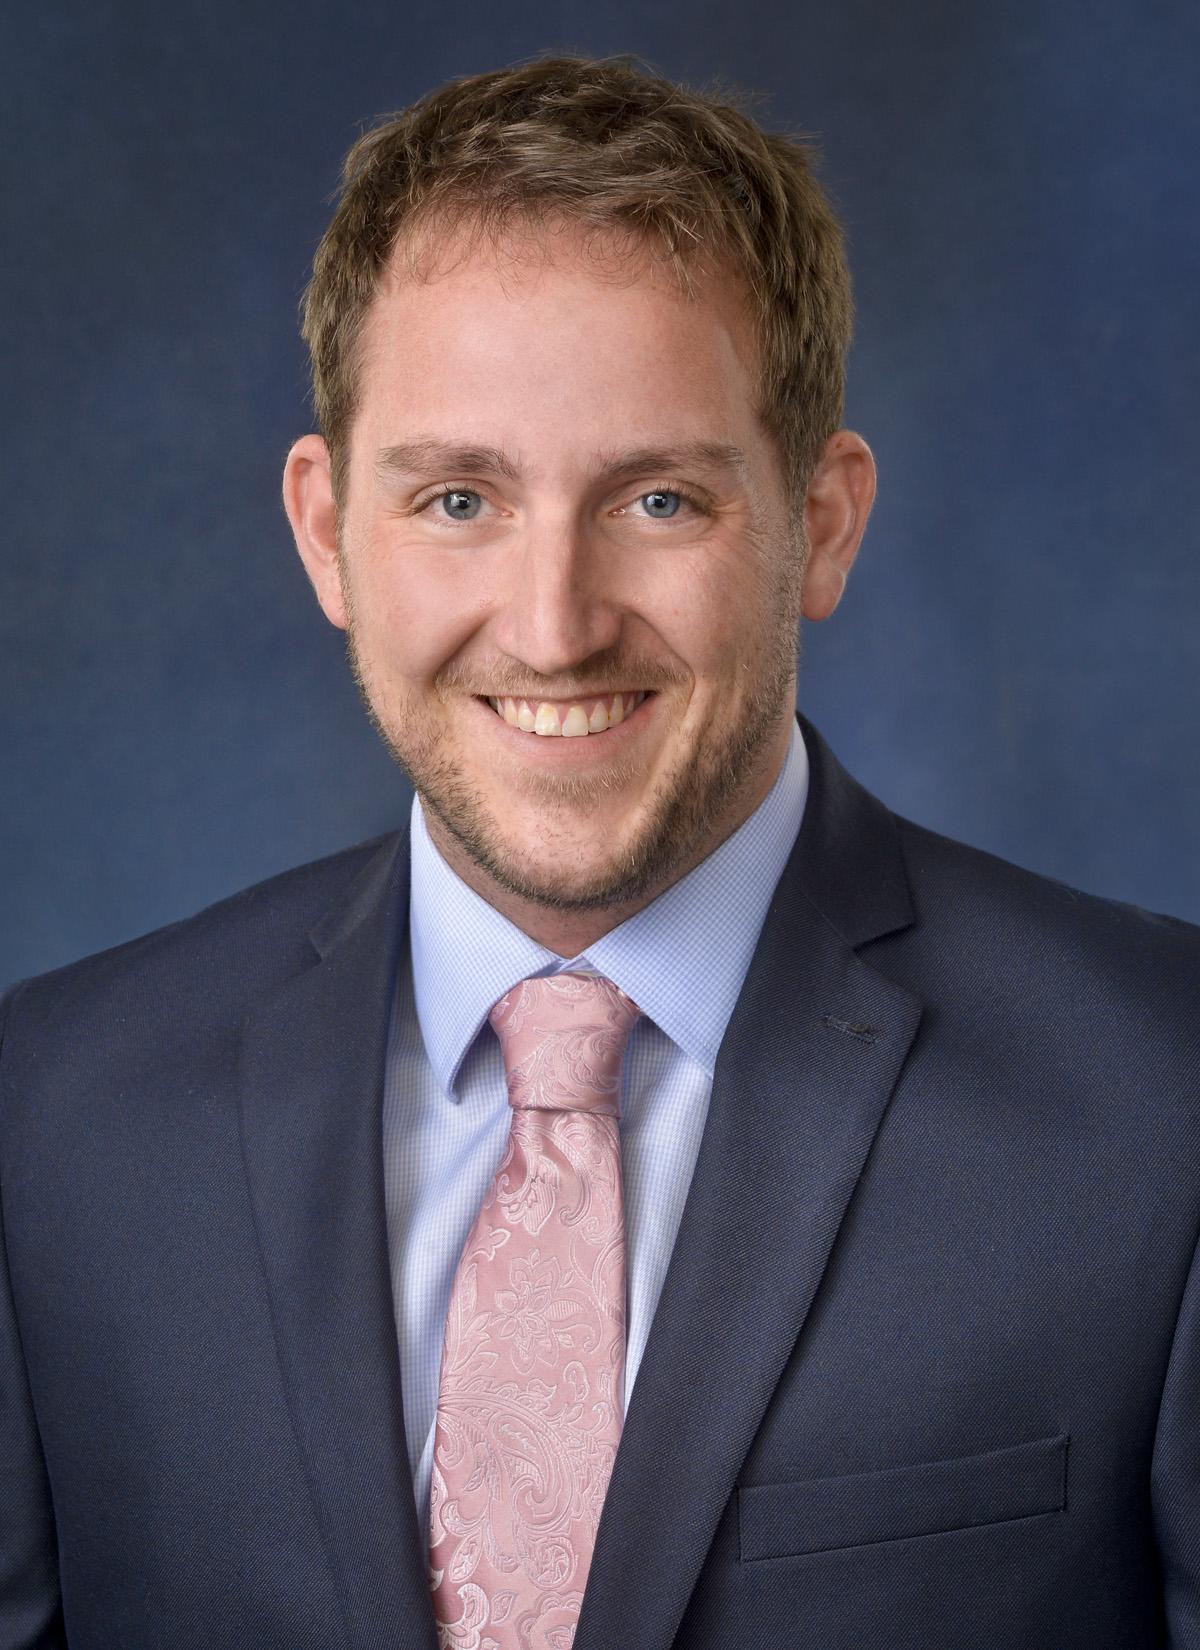 Chris Hamilton